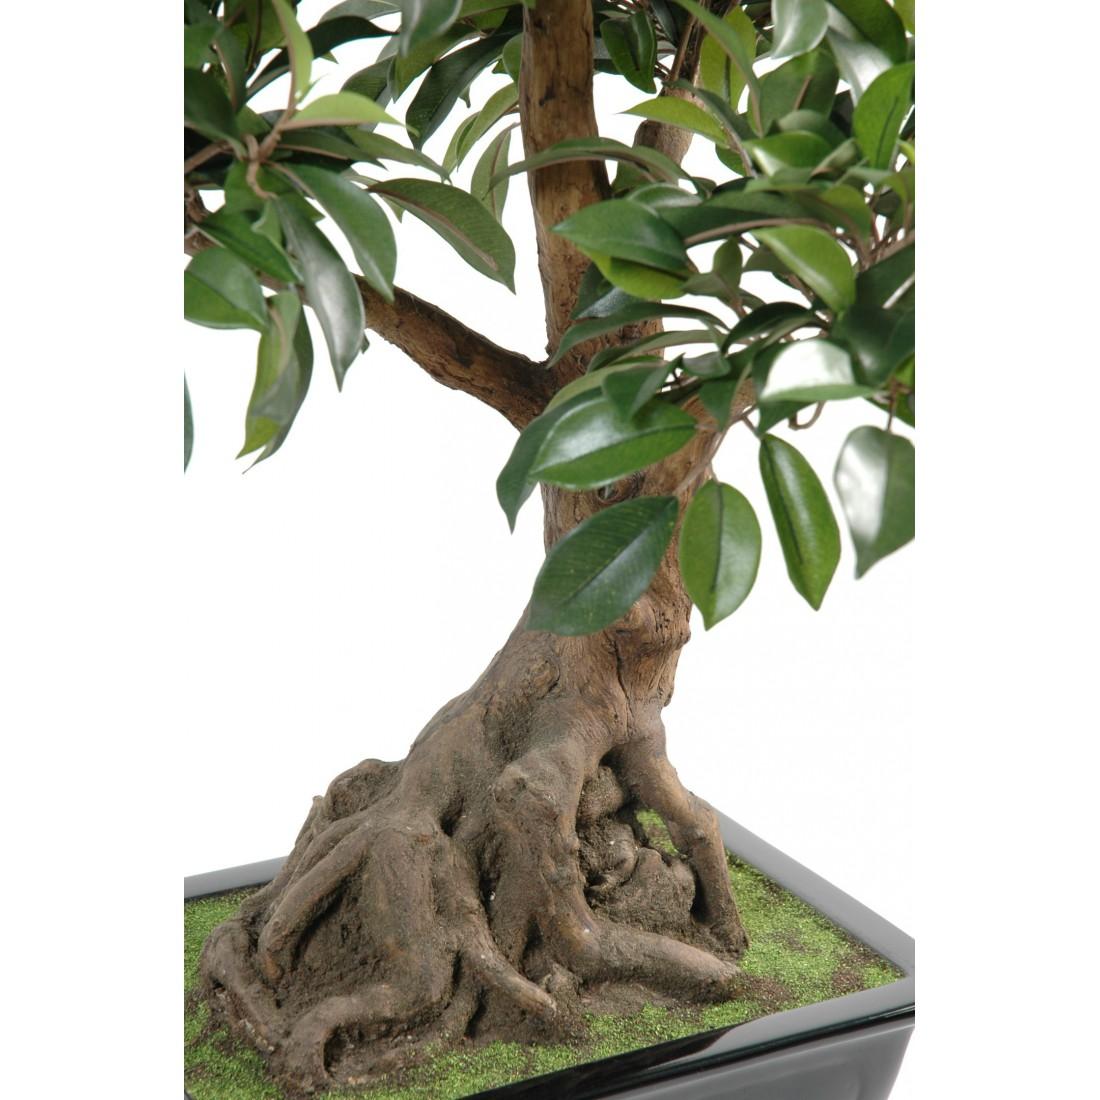 Bonsai Artificiel Ficus 58 Cm Vert Bonsa S Mini Plantes Reflets Nature Lyon